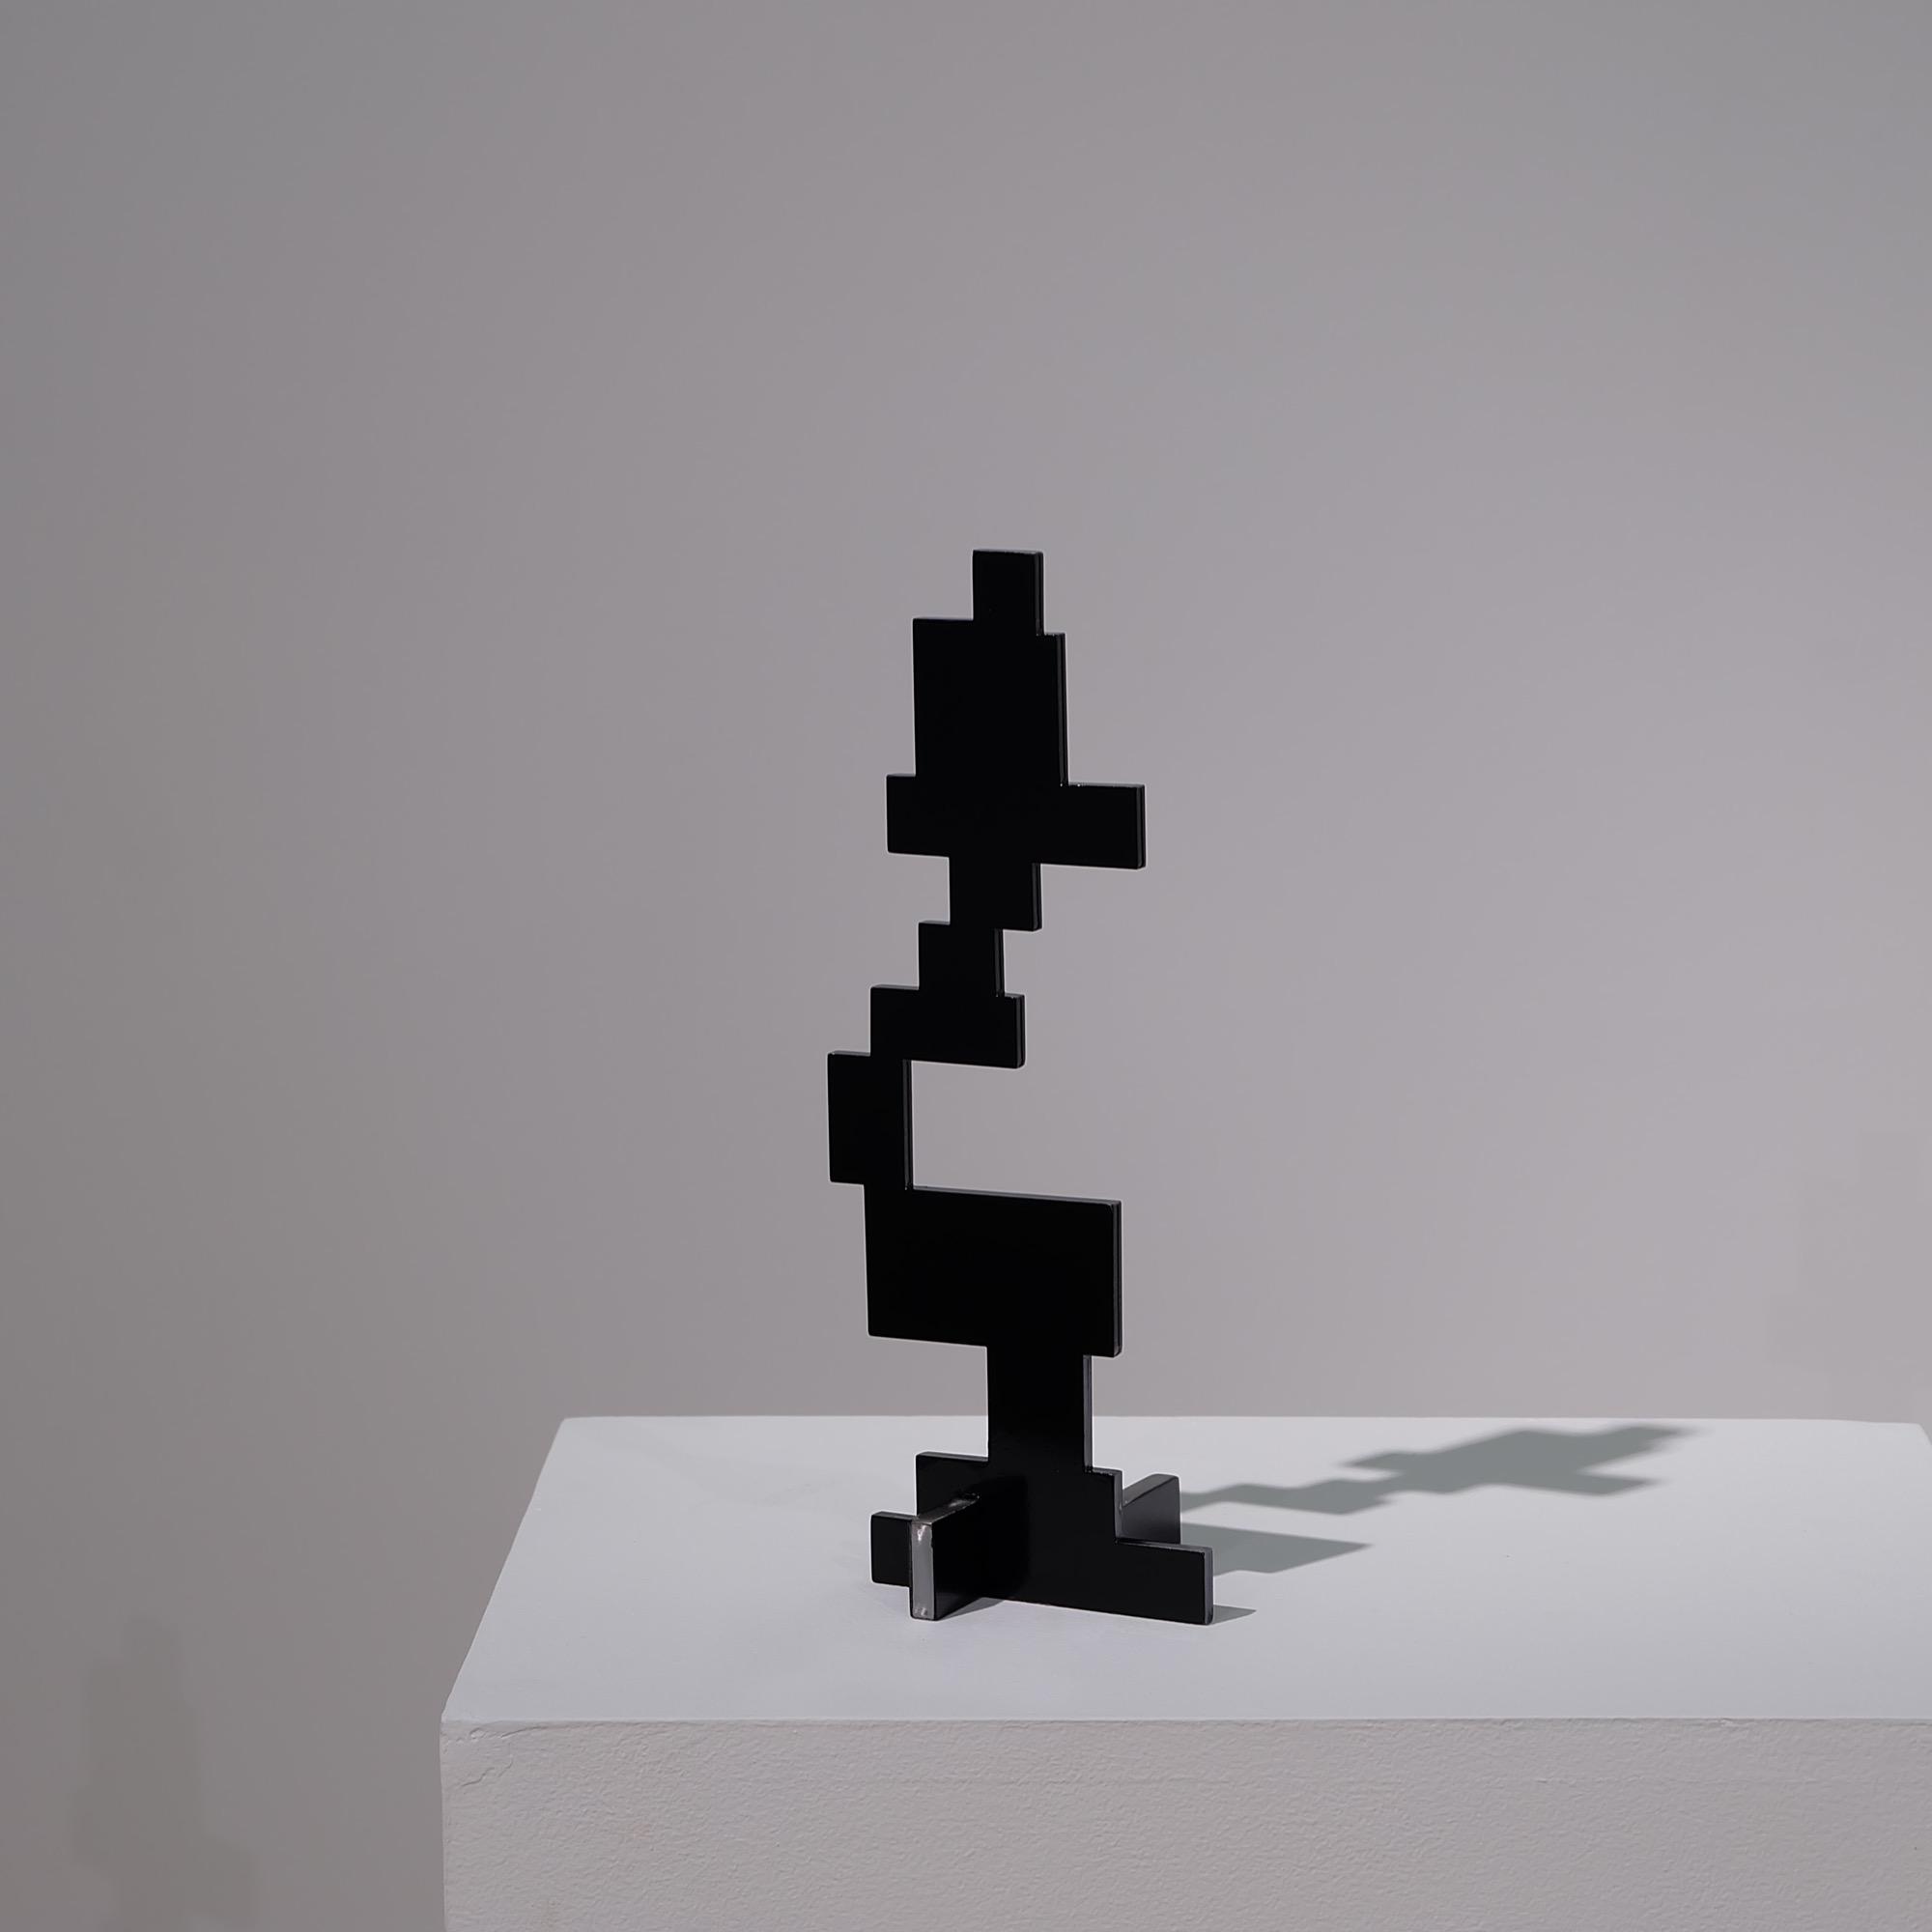 Sculpture #10218